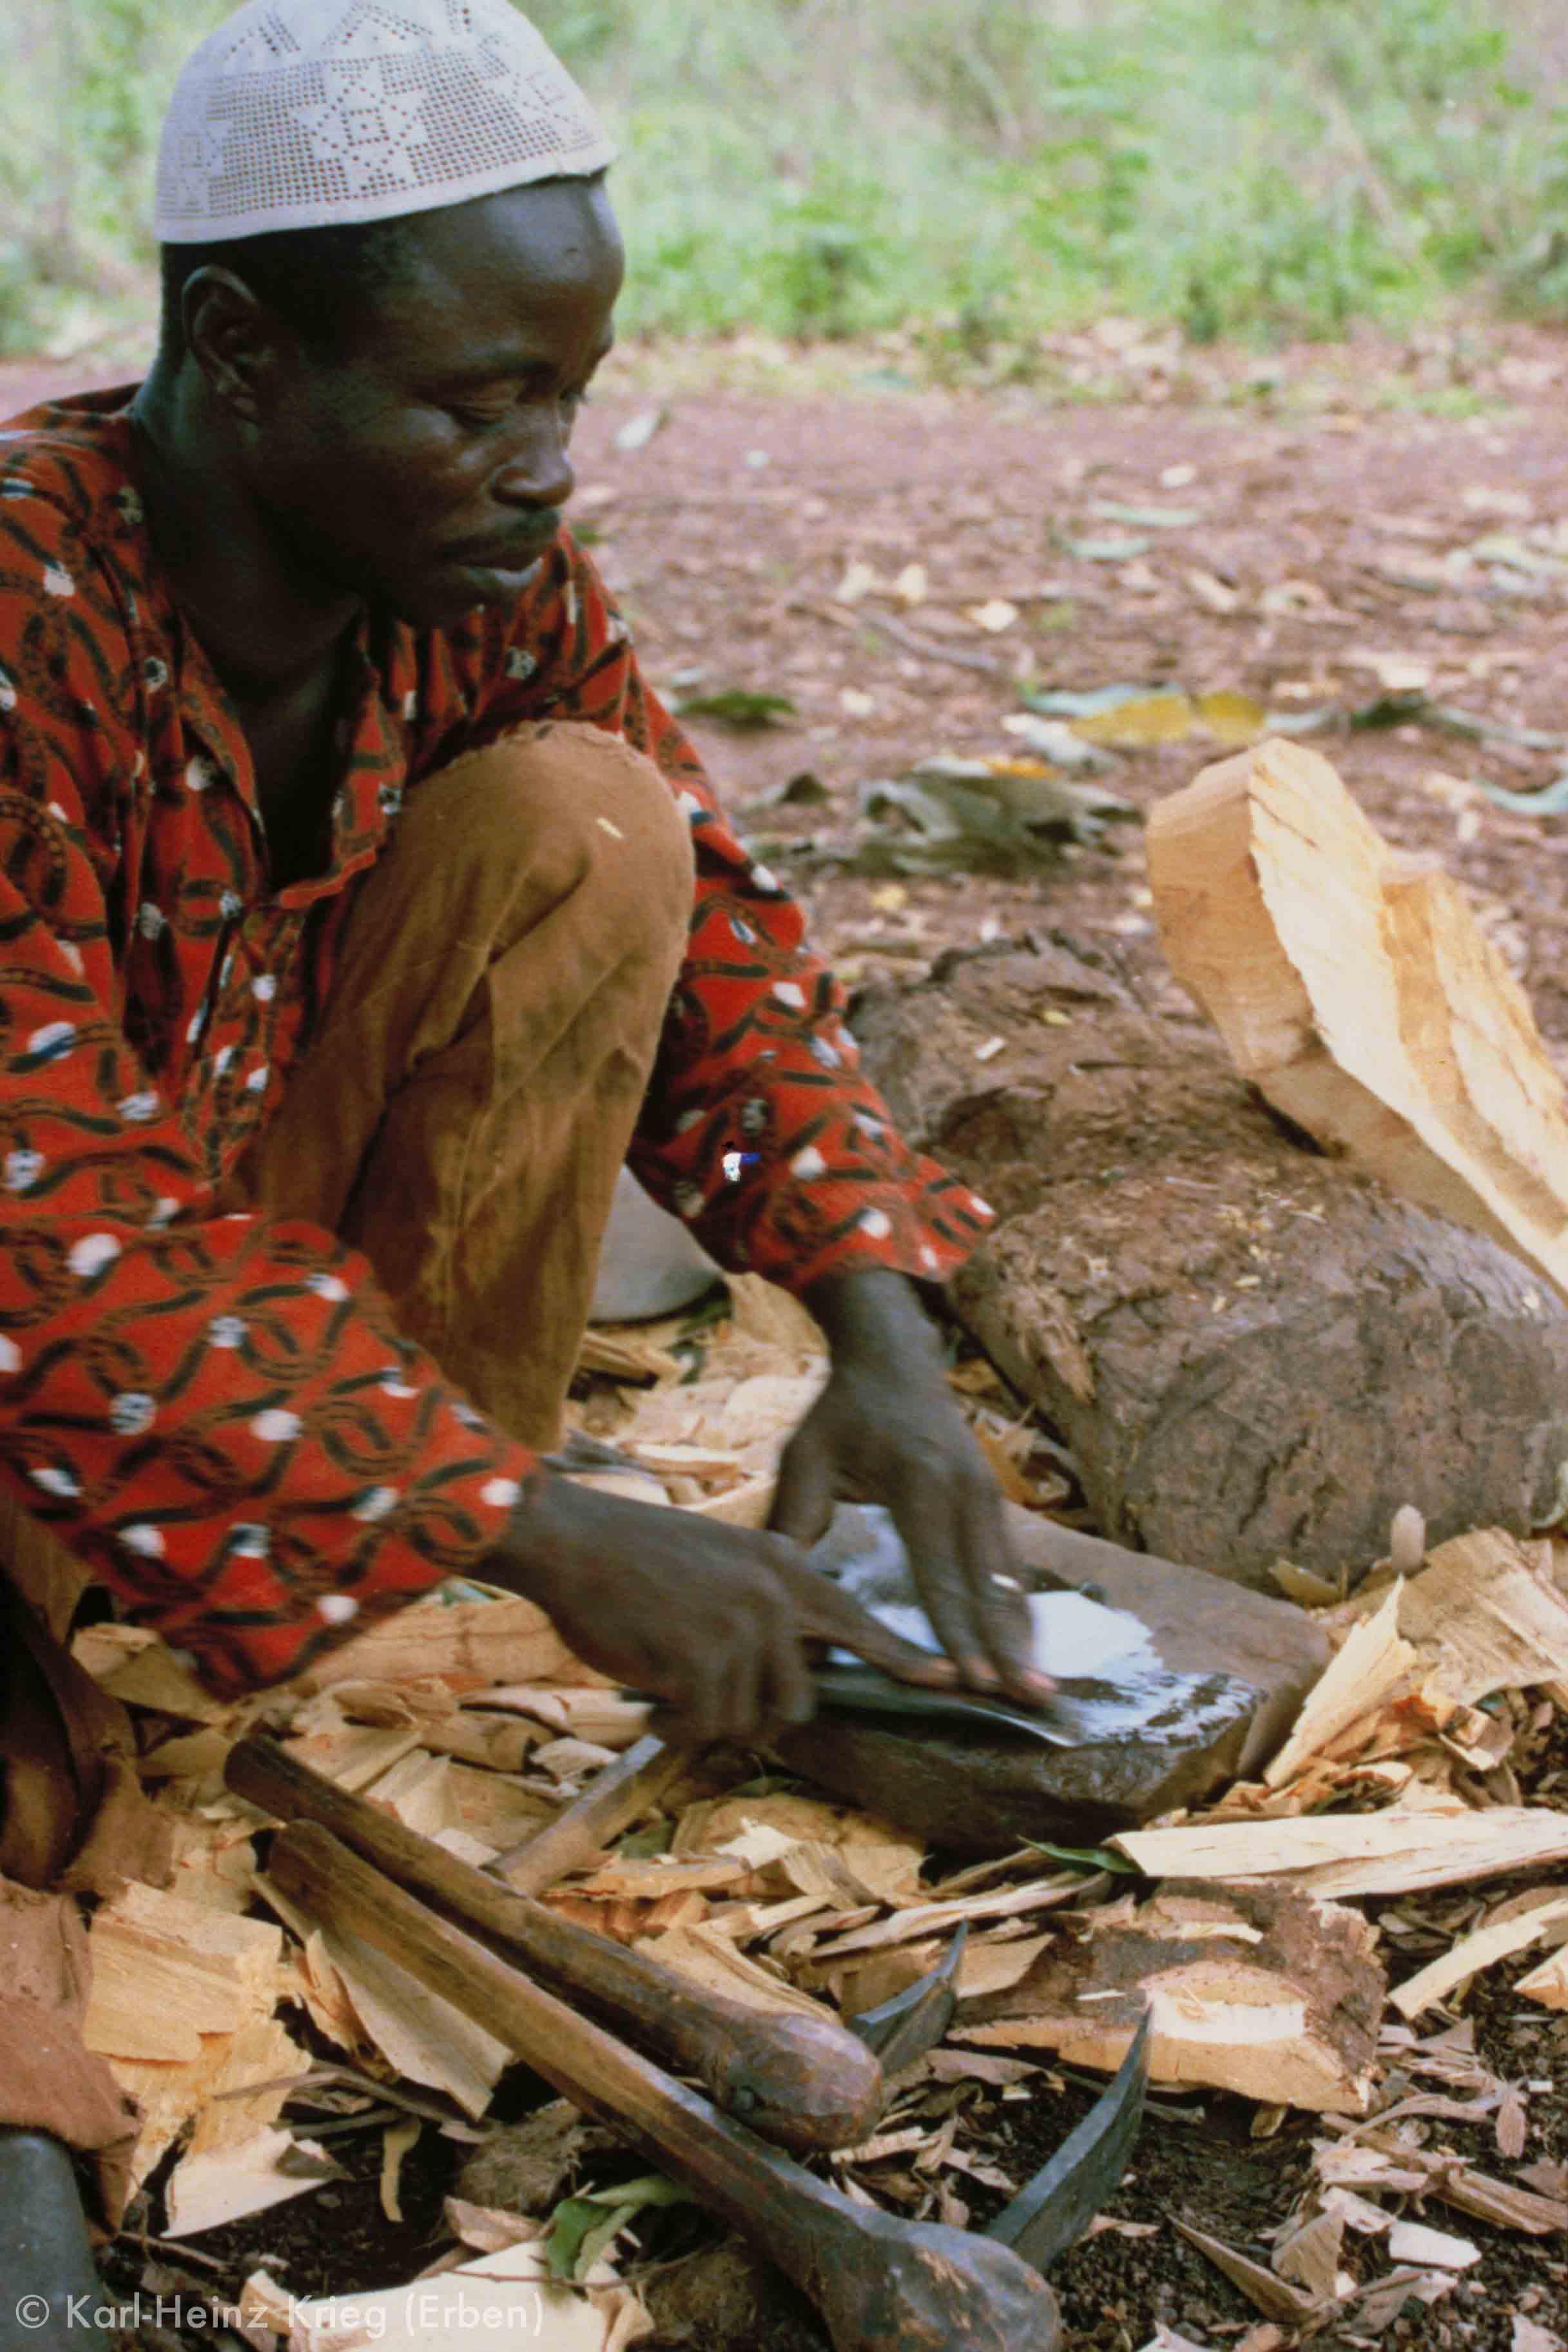 Sécondjéwin Dagnogo sharpening toos.Ziédougou (Region of Boundiali, Côte d'Ivoire), 1980.Photo: Karl-Heinz Krieg